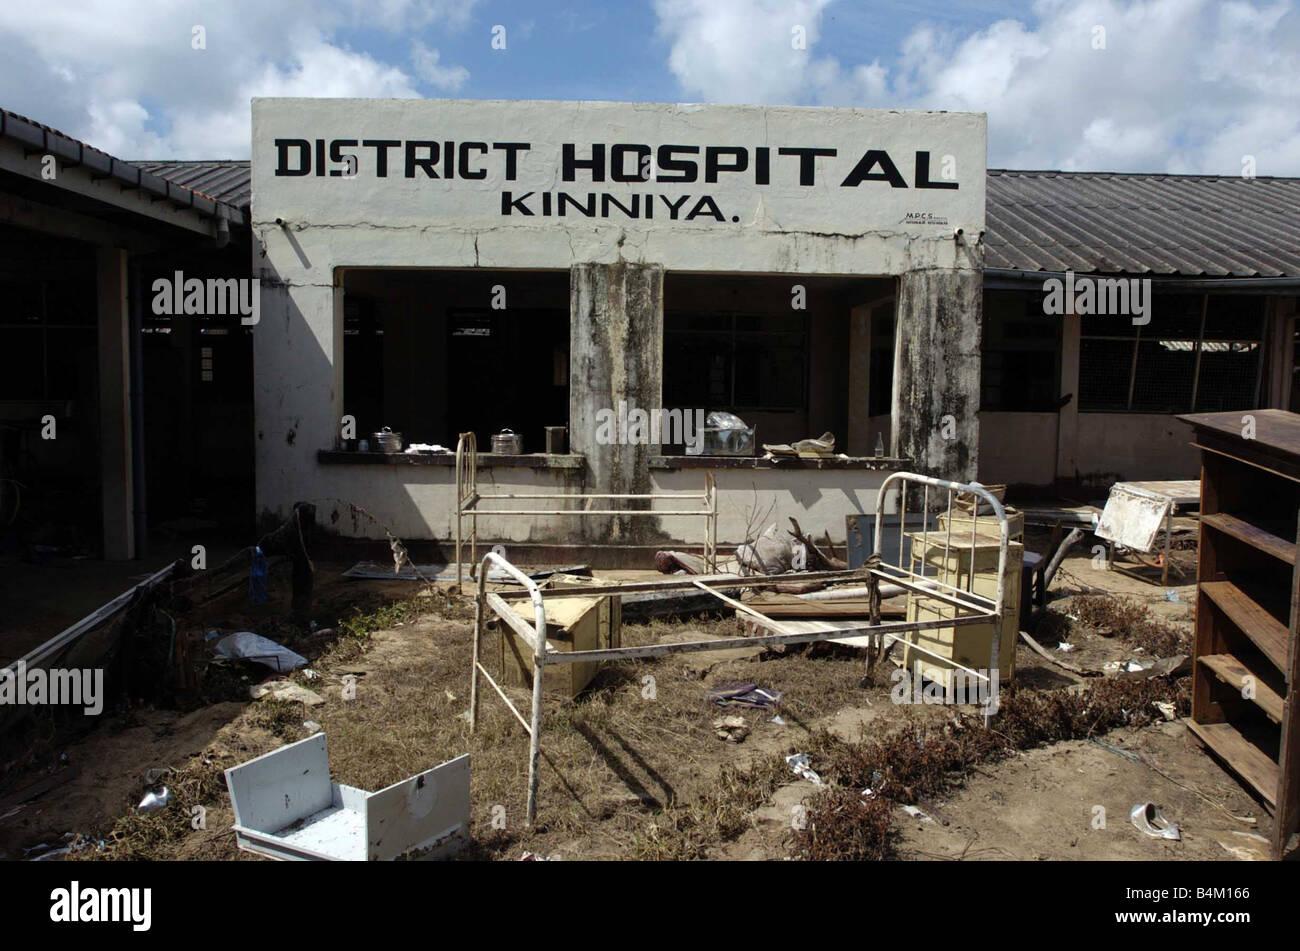 Tsunami Natural Disaster Sri Lanka January 2005 Kinnya Hospital - Stock Image